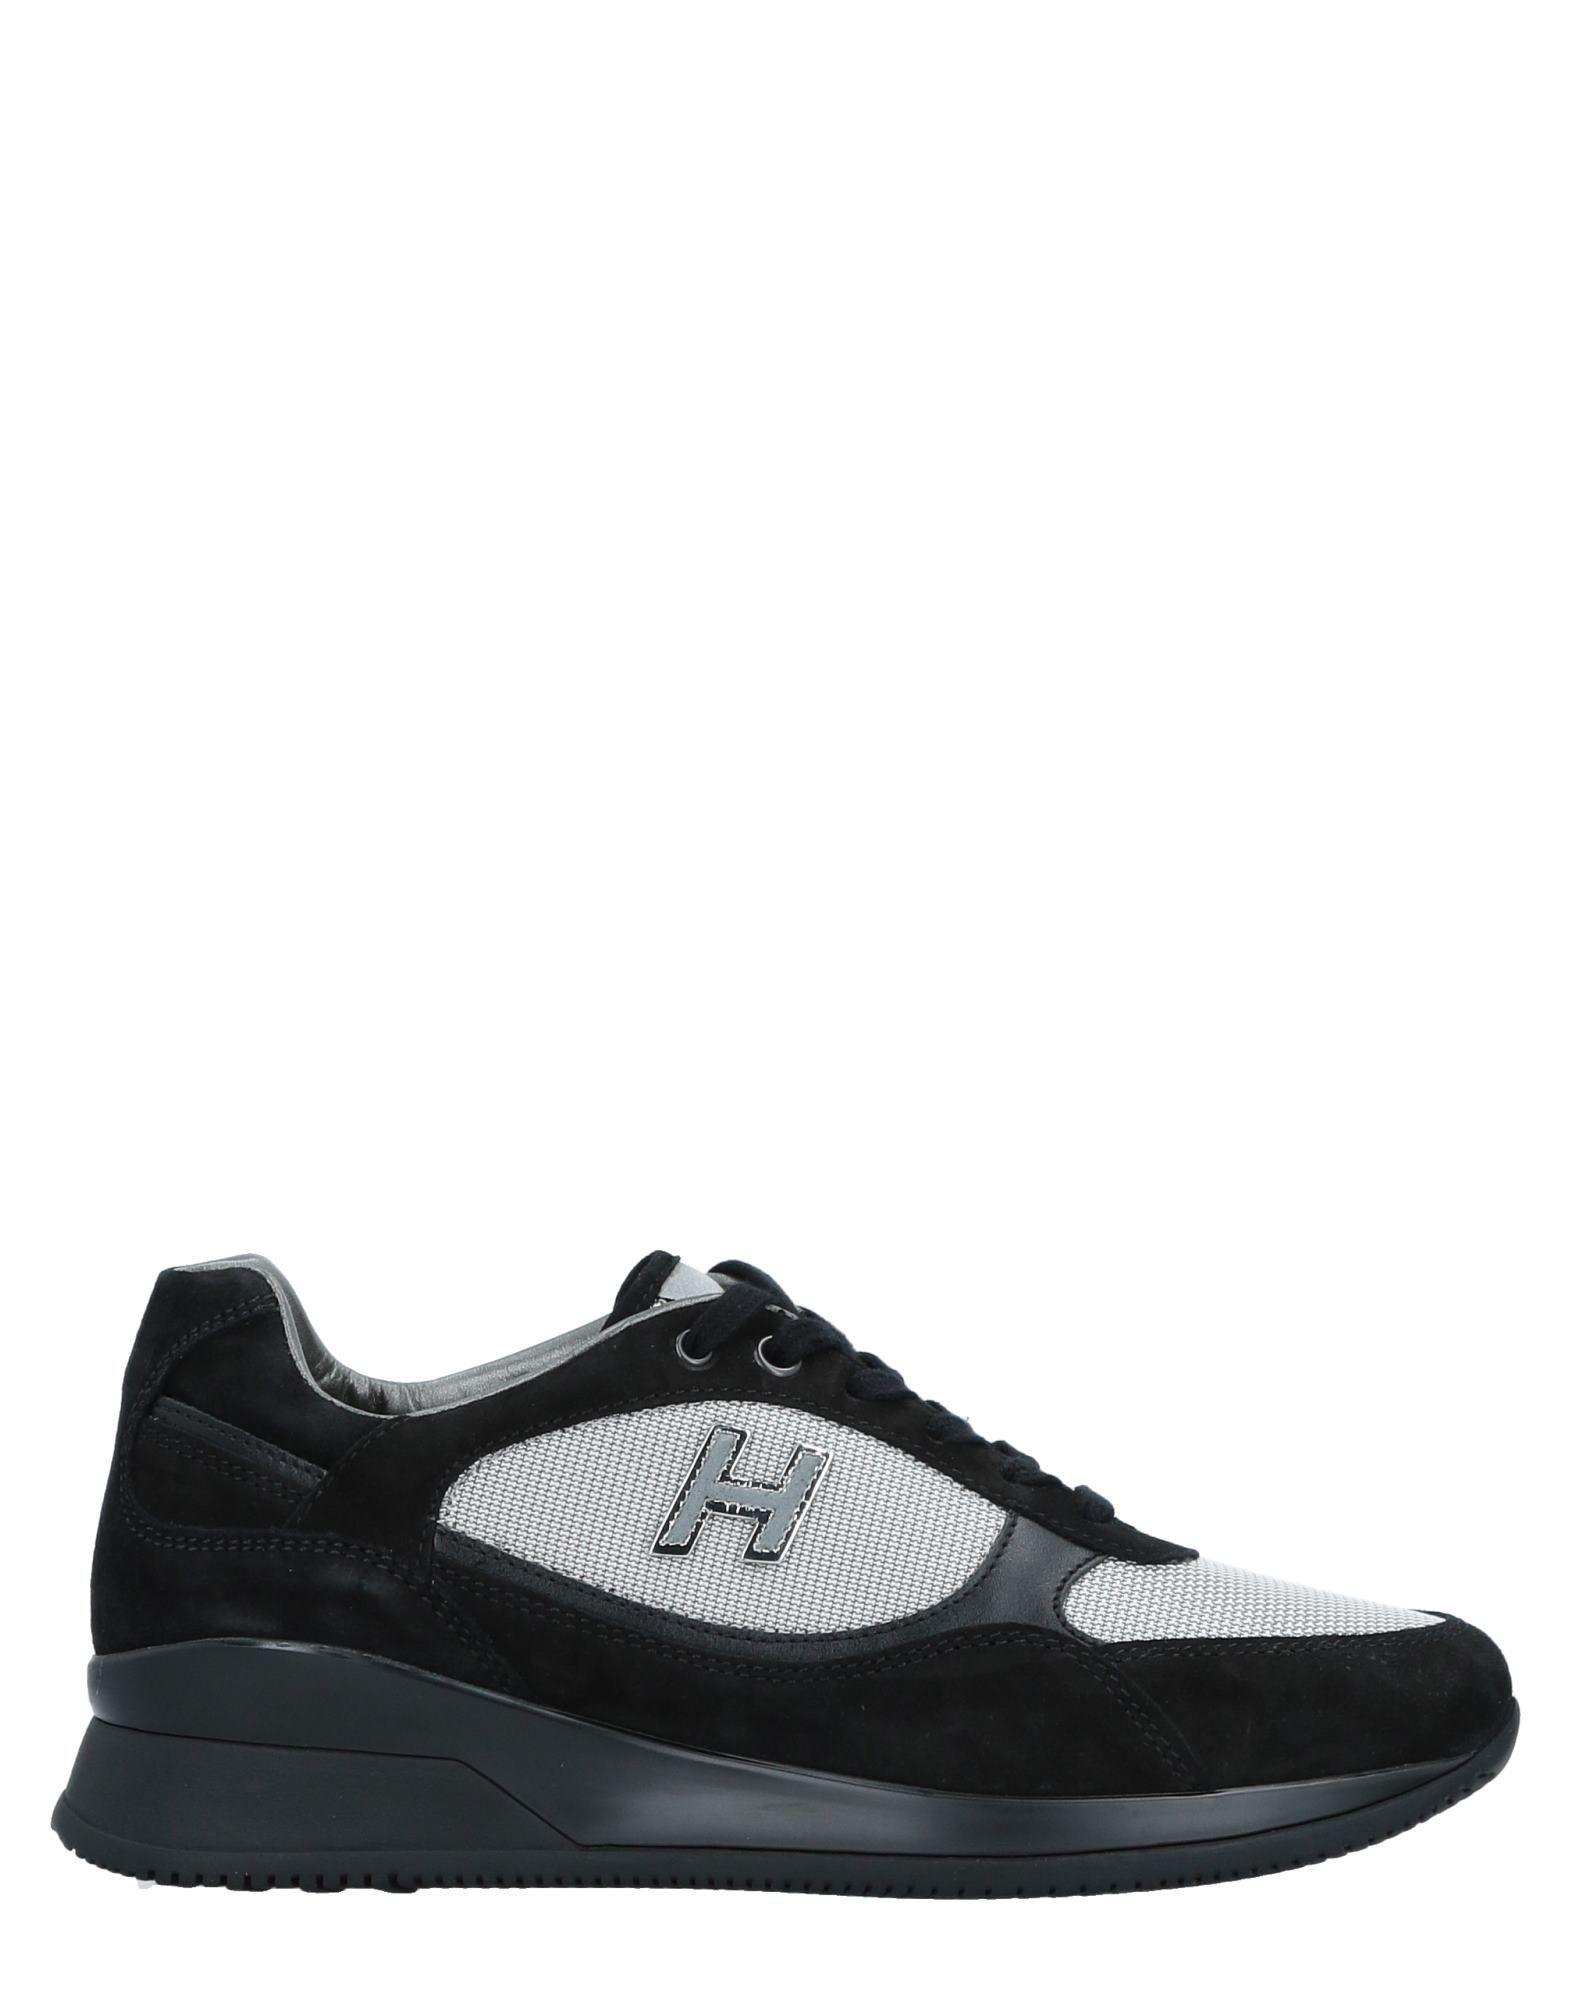 Moda Sneakers Hogan Donna - 11520568JD